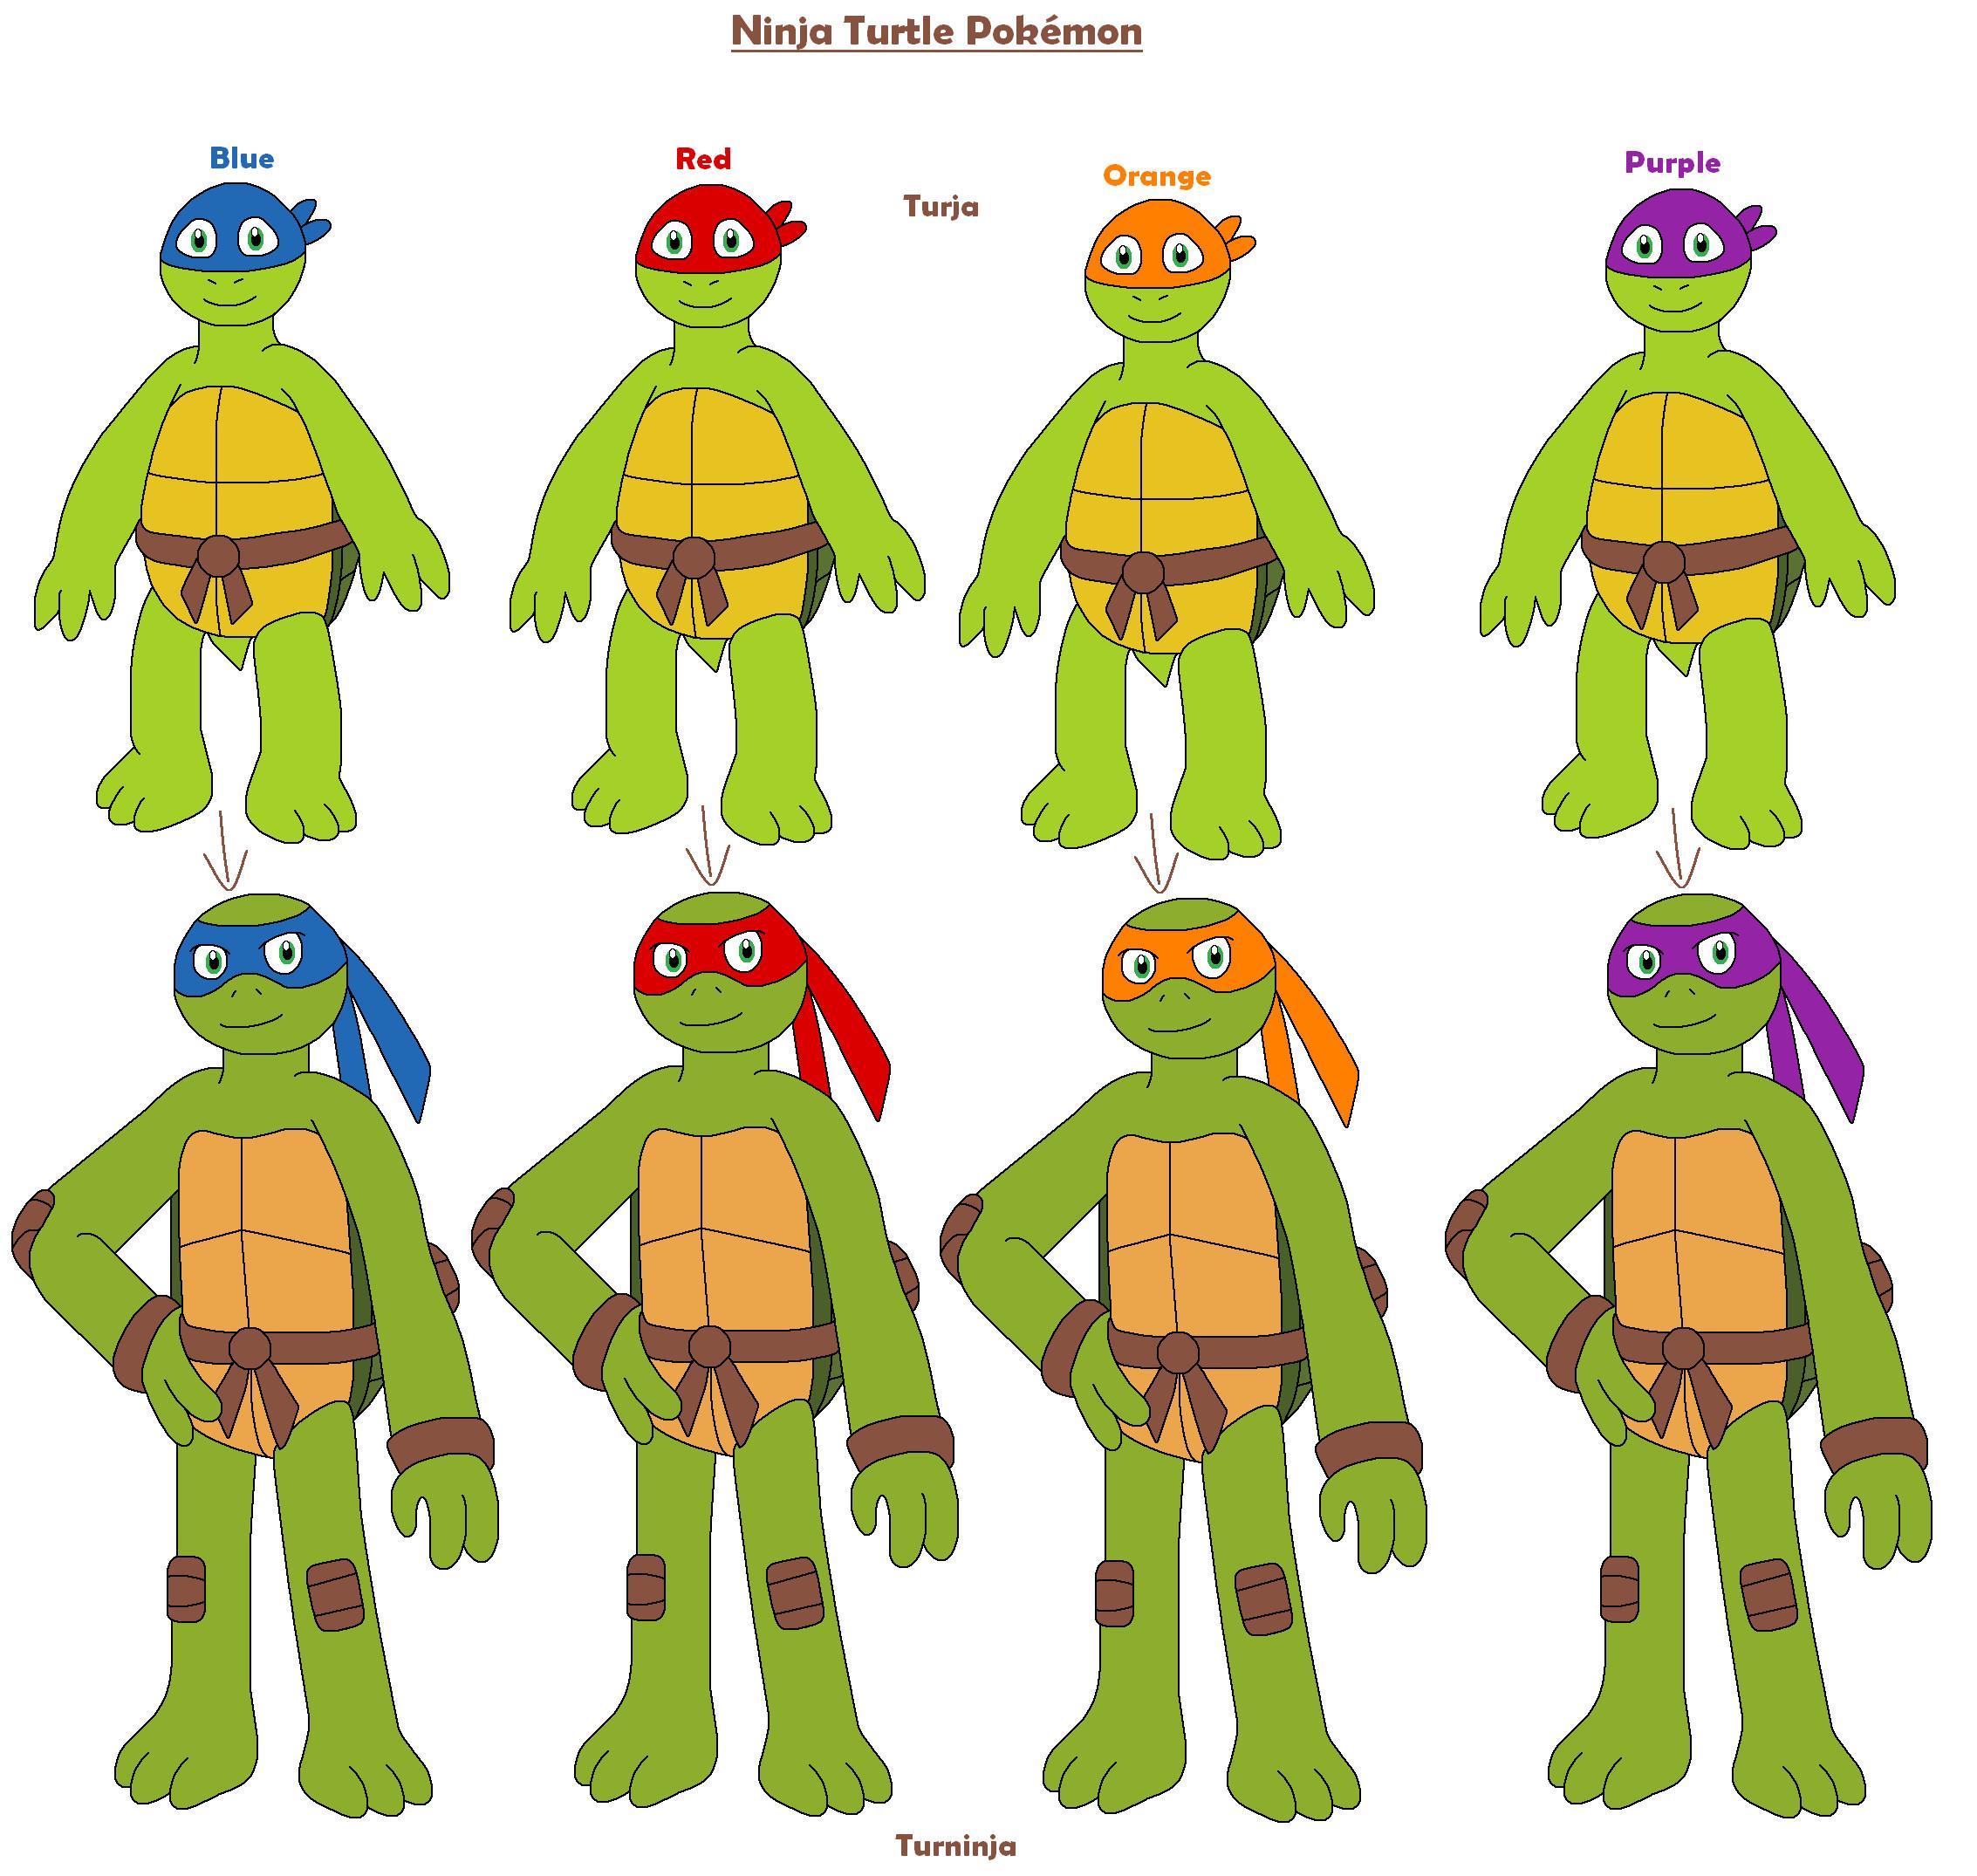 Mutant ninja turtles wikipedia the free the teenage mutant ninja